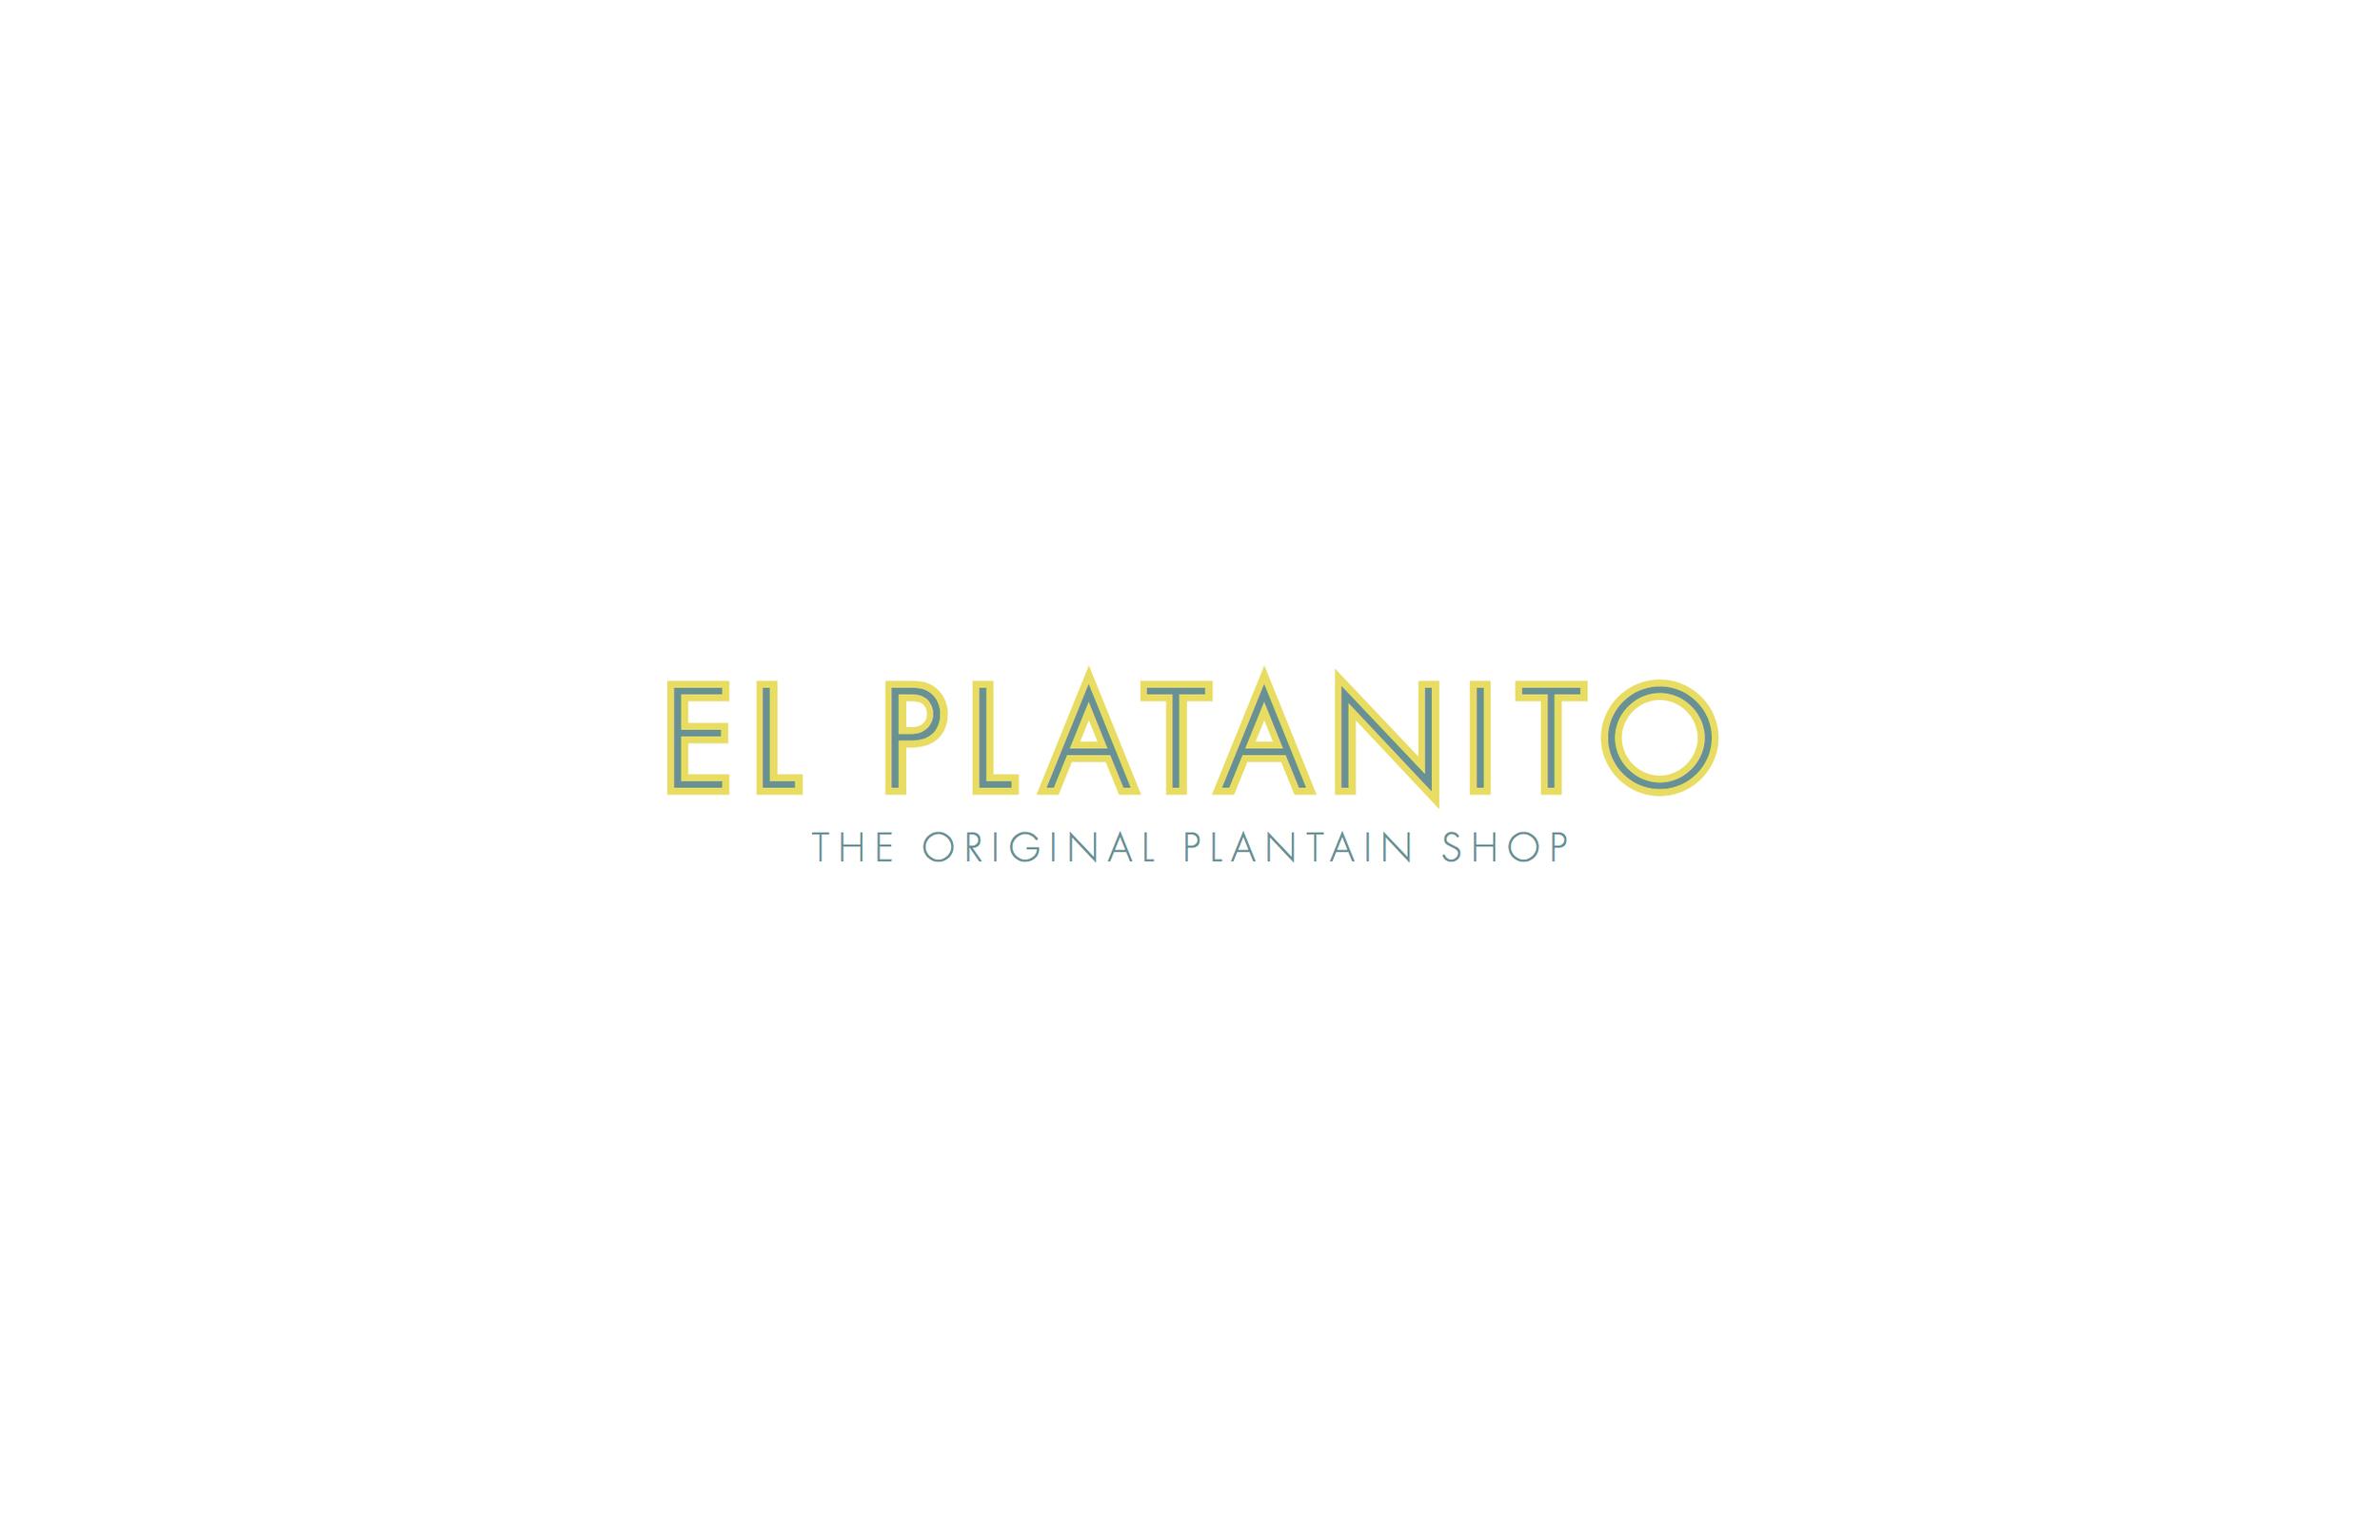 ElPlatanito_FinalPresentation.jpg